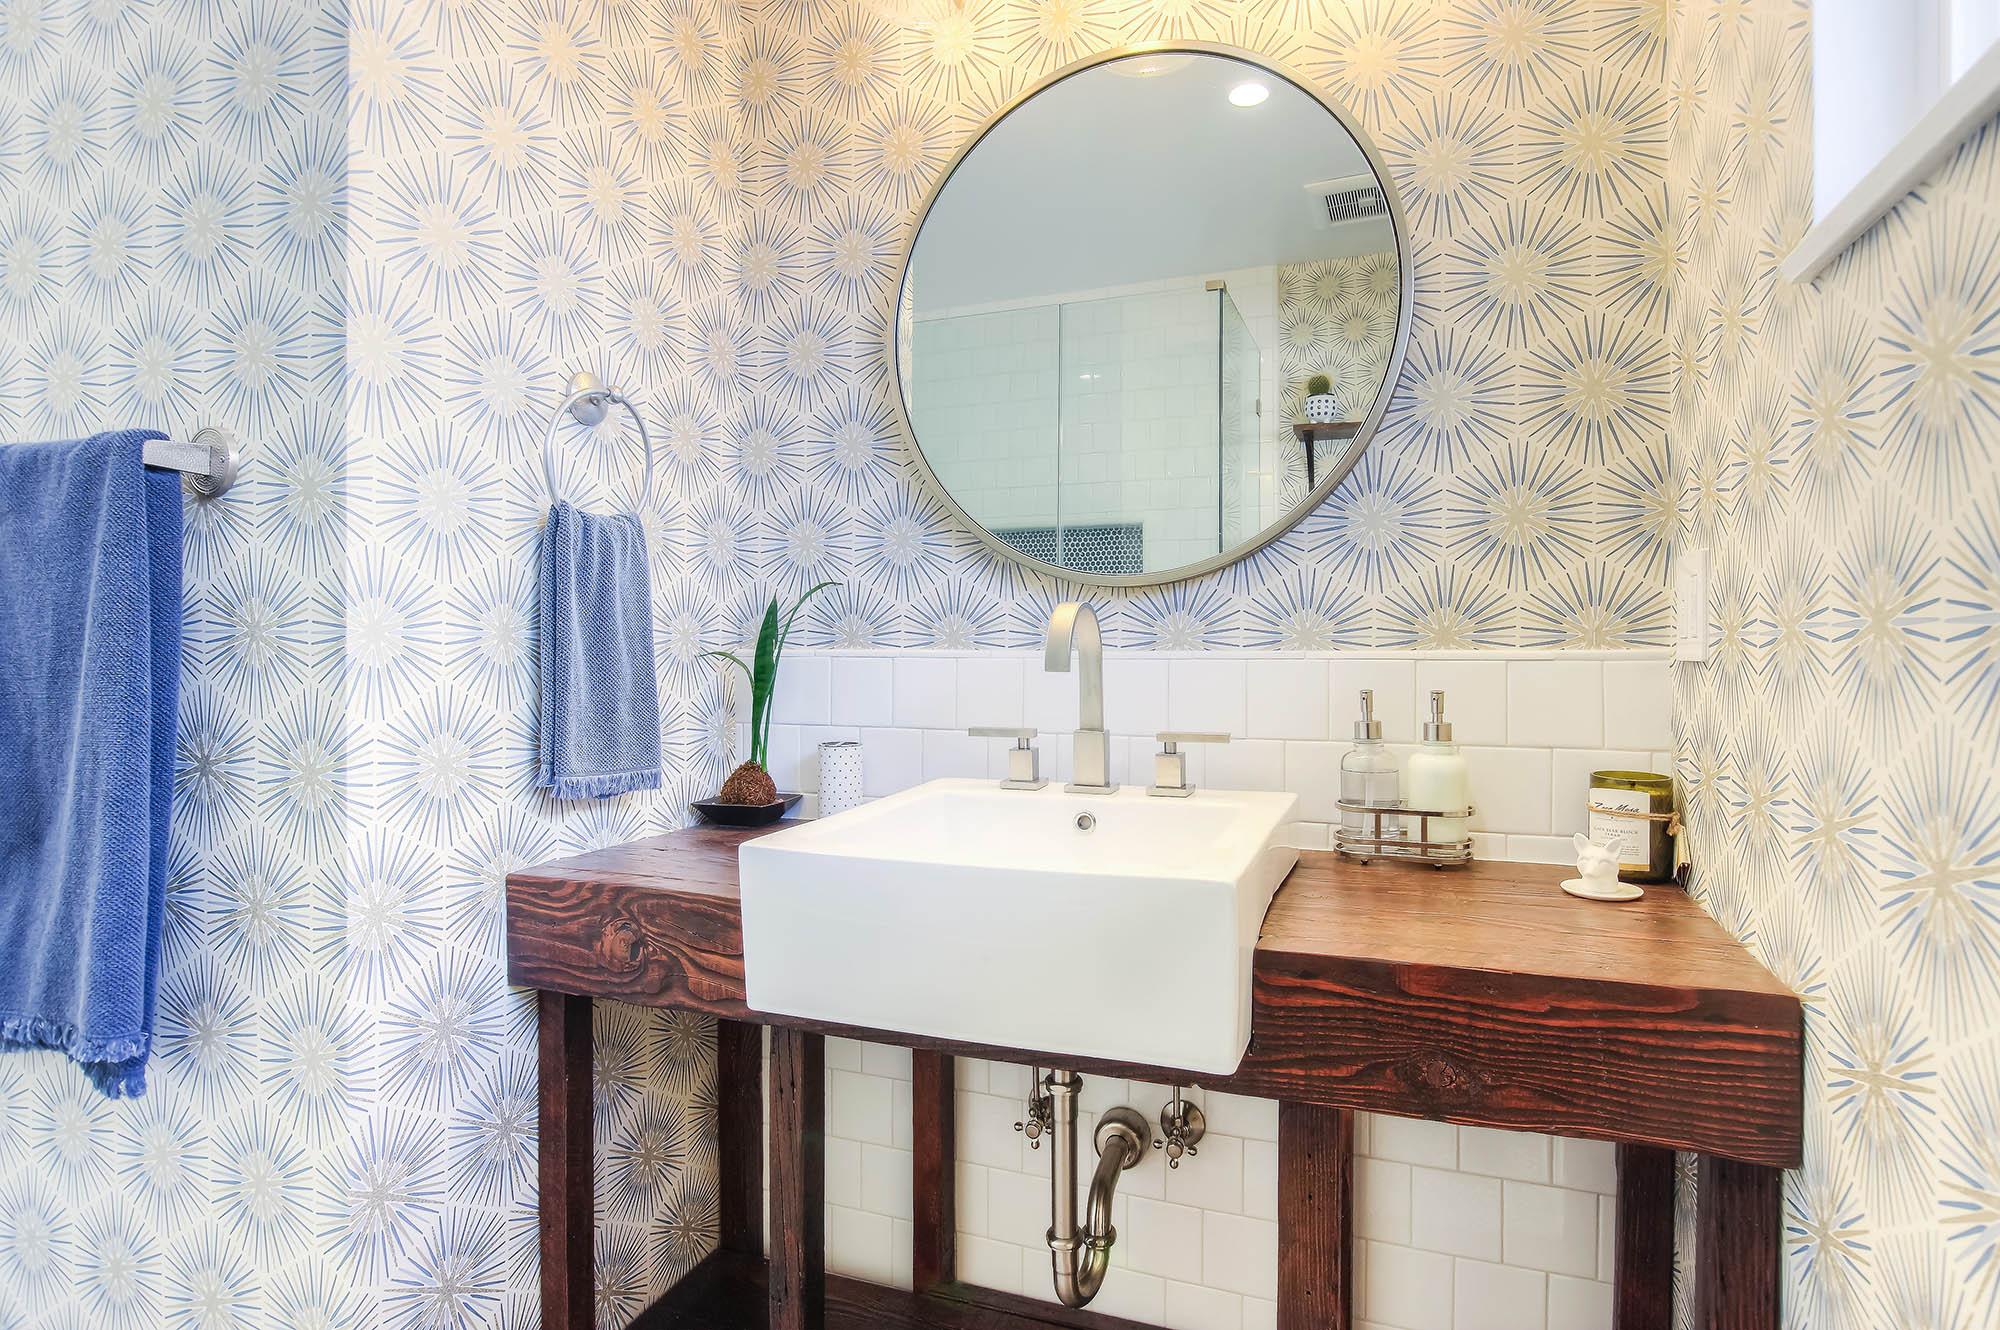 Toluca Lake bathroom remodel